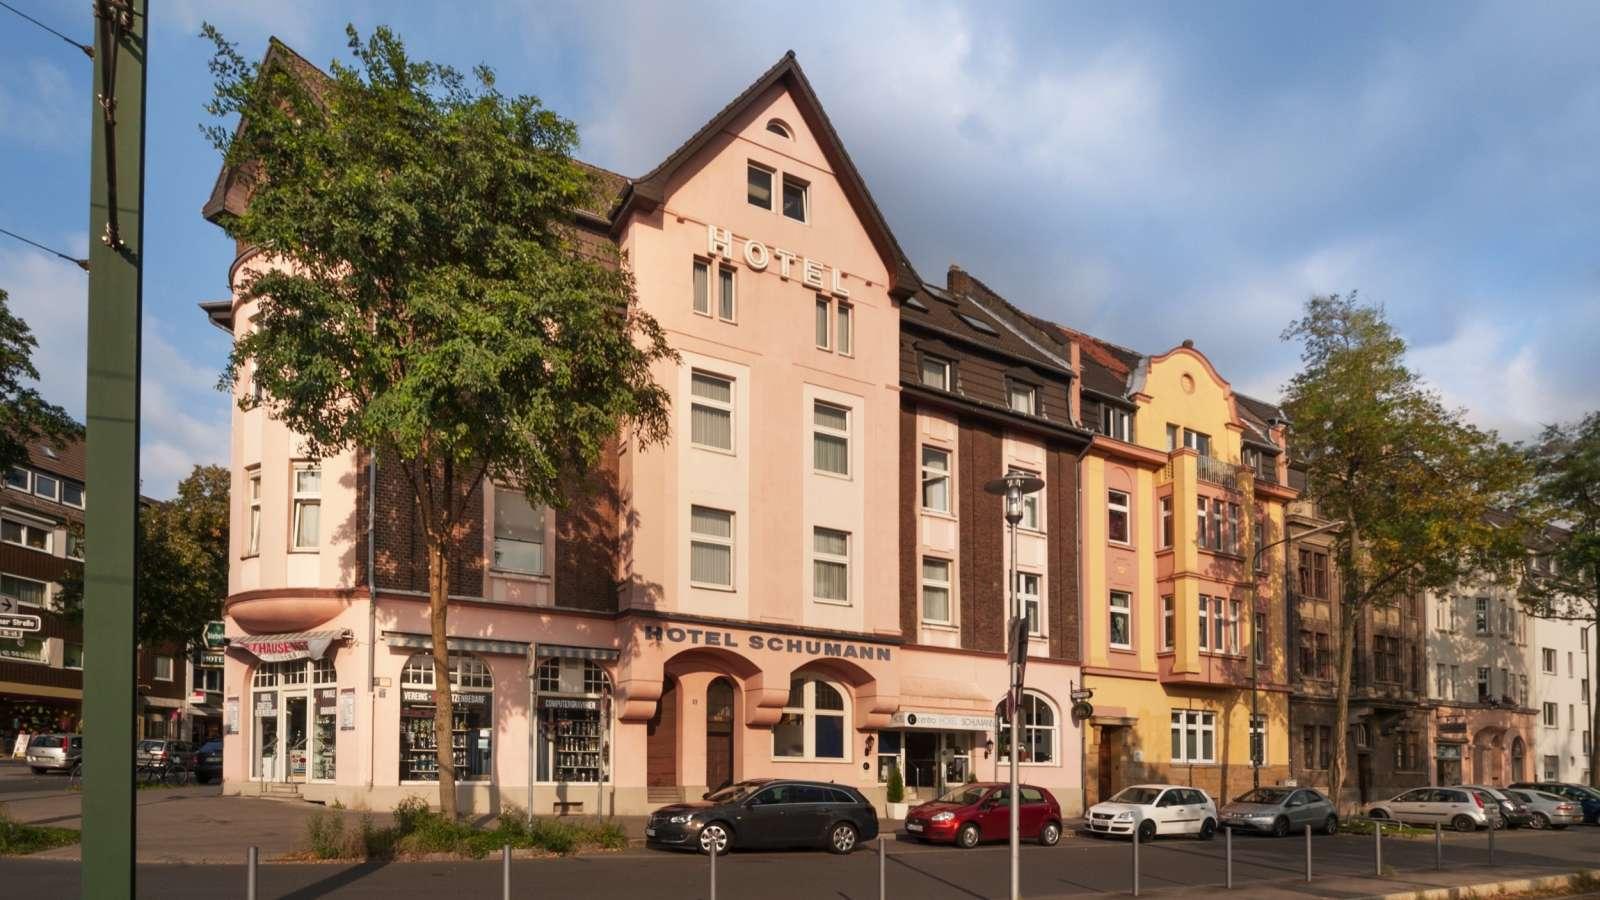 Centro hotel schumann in d sseldorf for Hotel centro